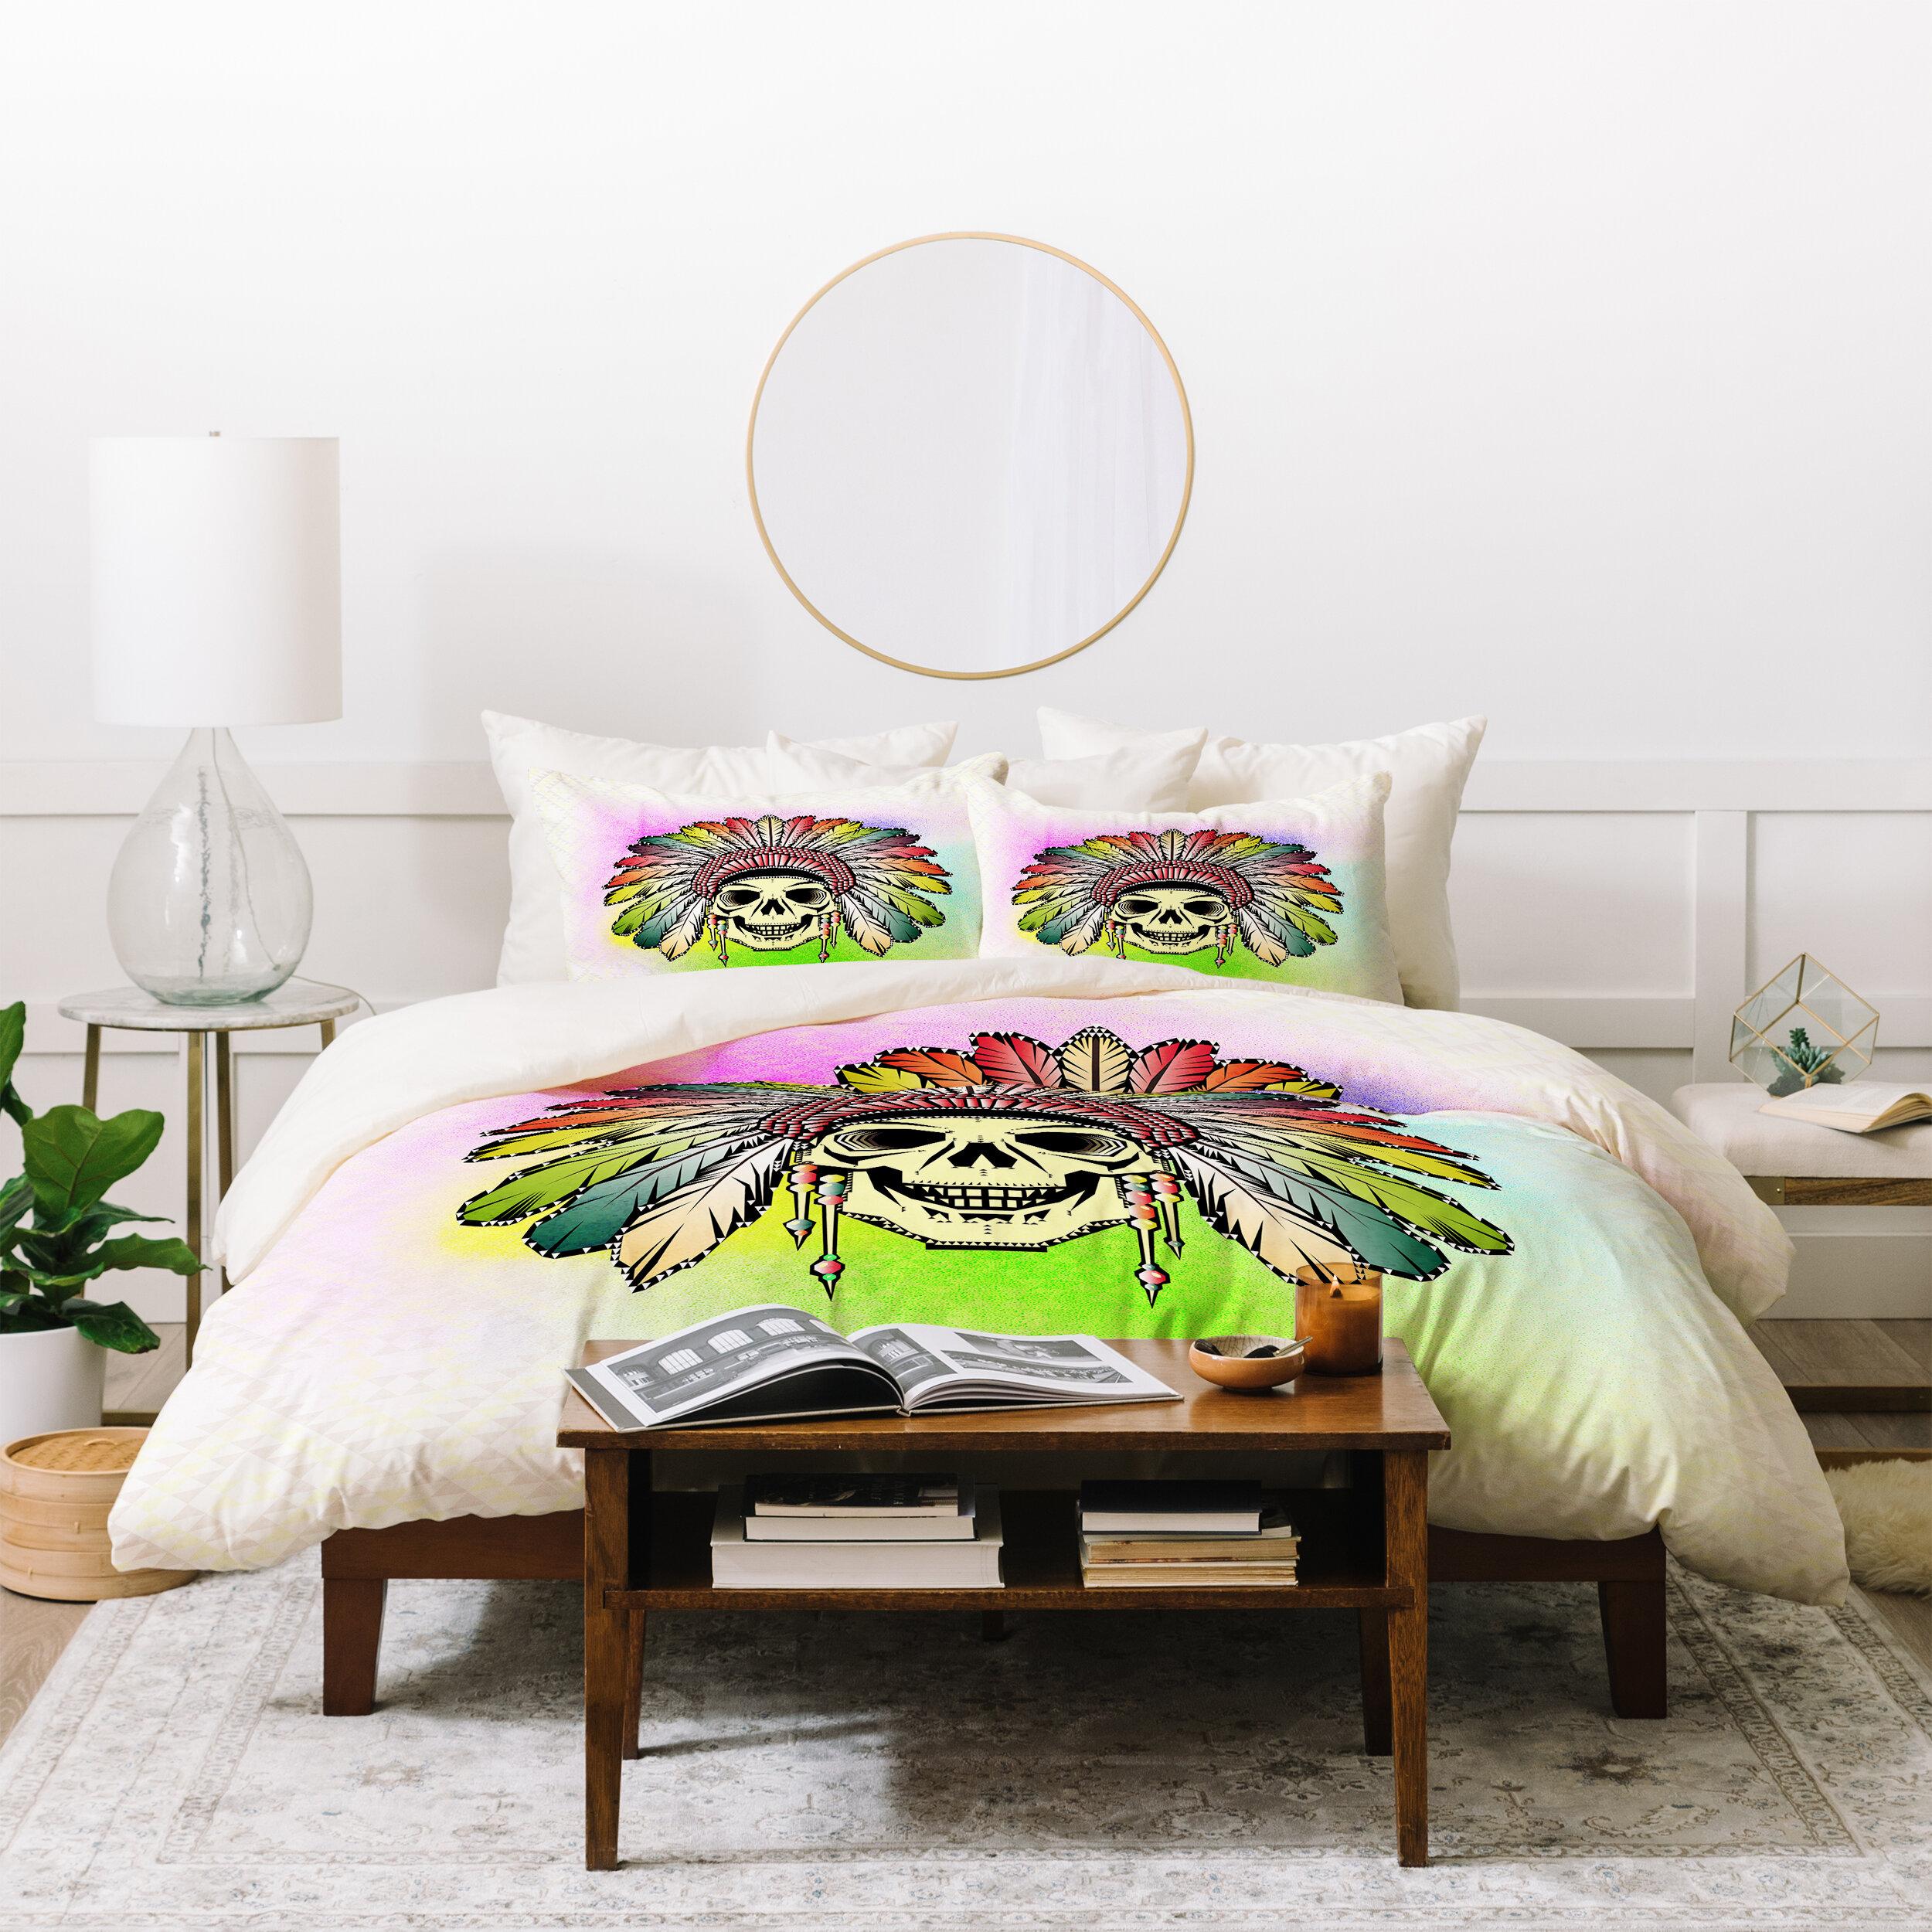 East Urban Home Chobopop 3 Piece Duvet Cover Set Wayfair